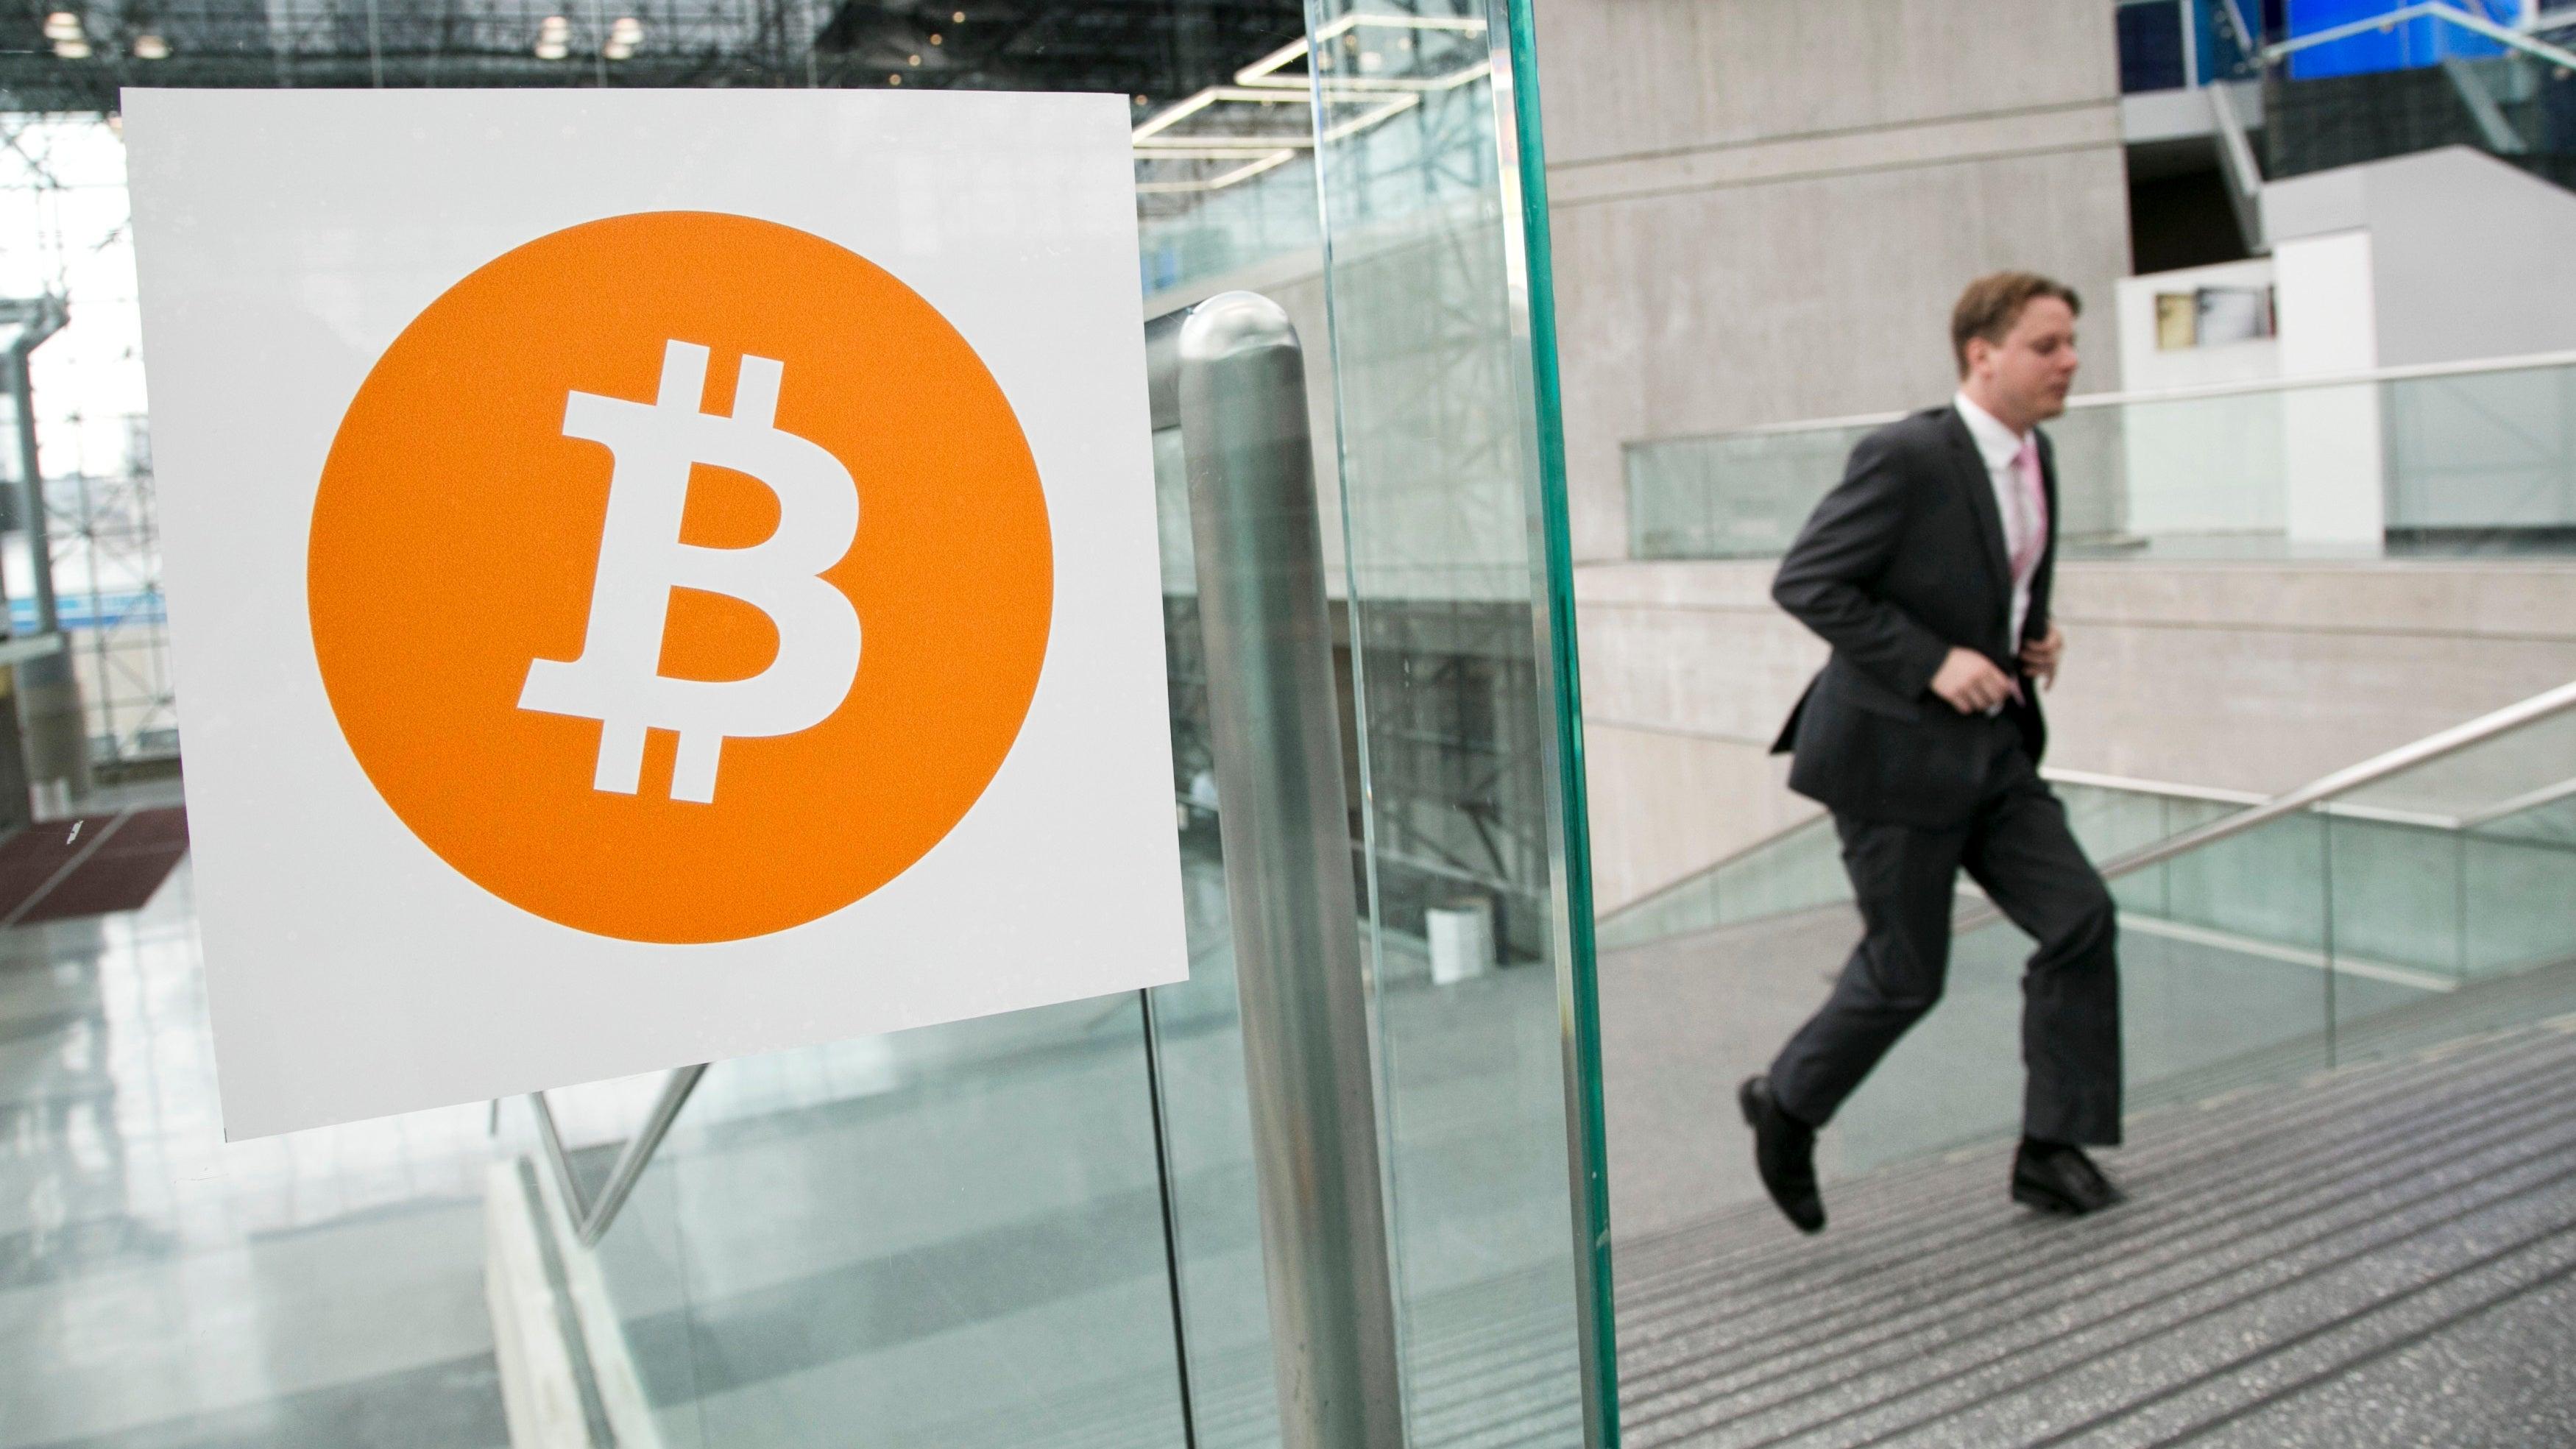 Cryptocurrency Speculators Watch Nervouslyas South Korea Bans ICOs